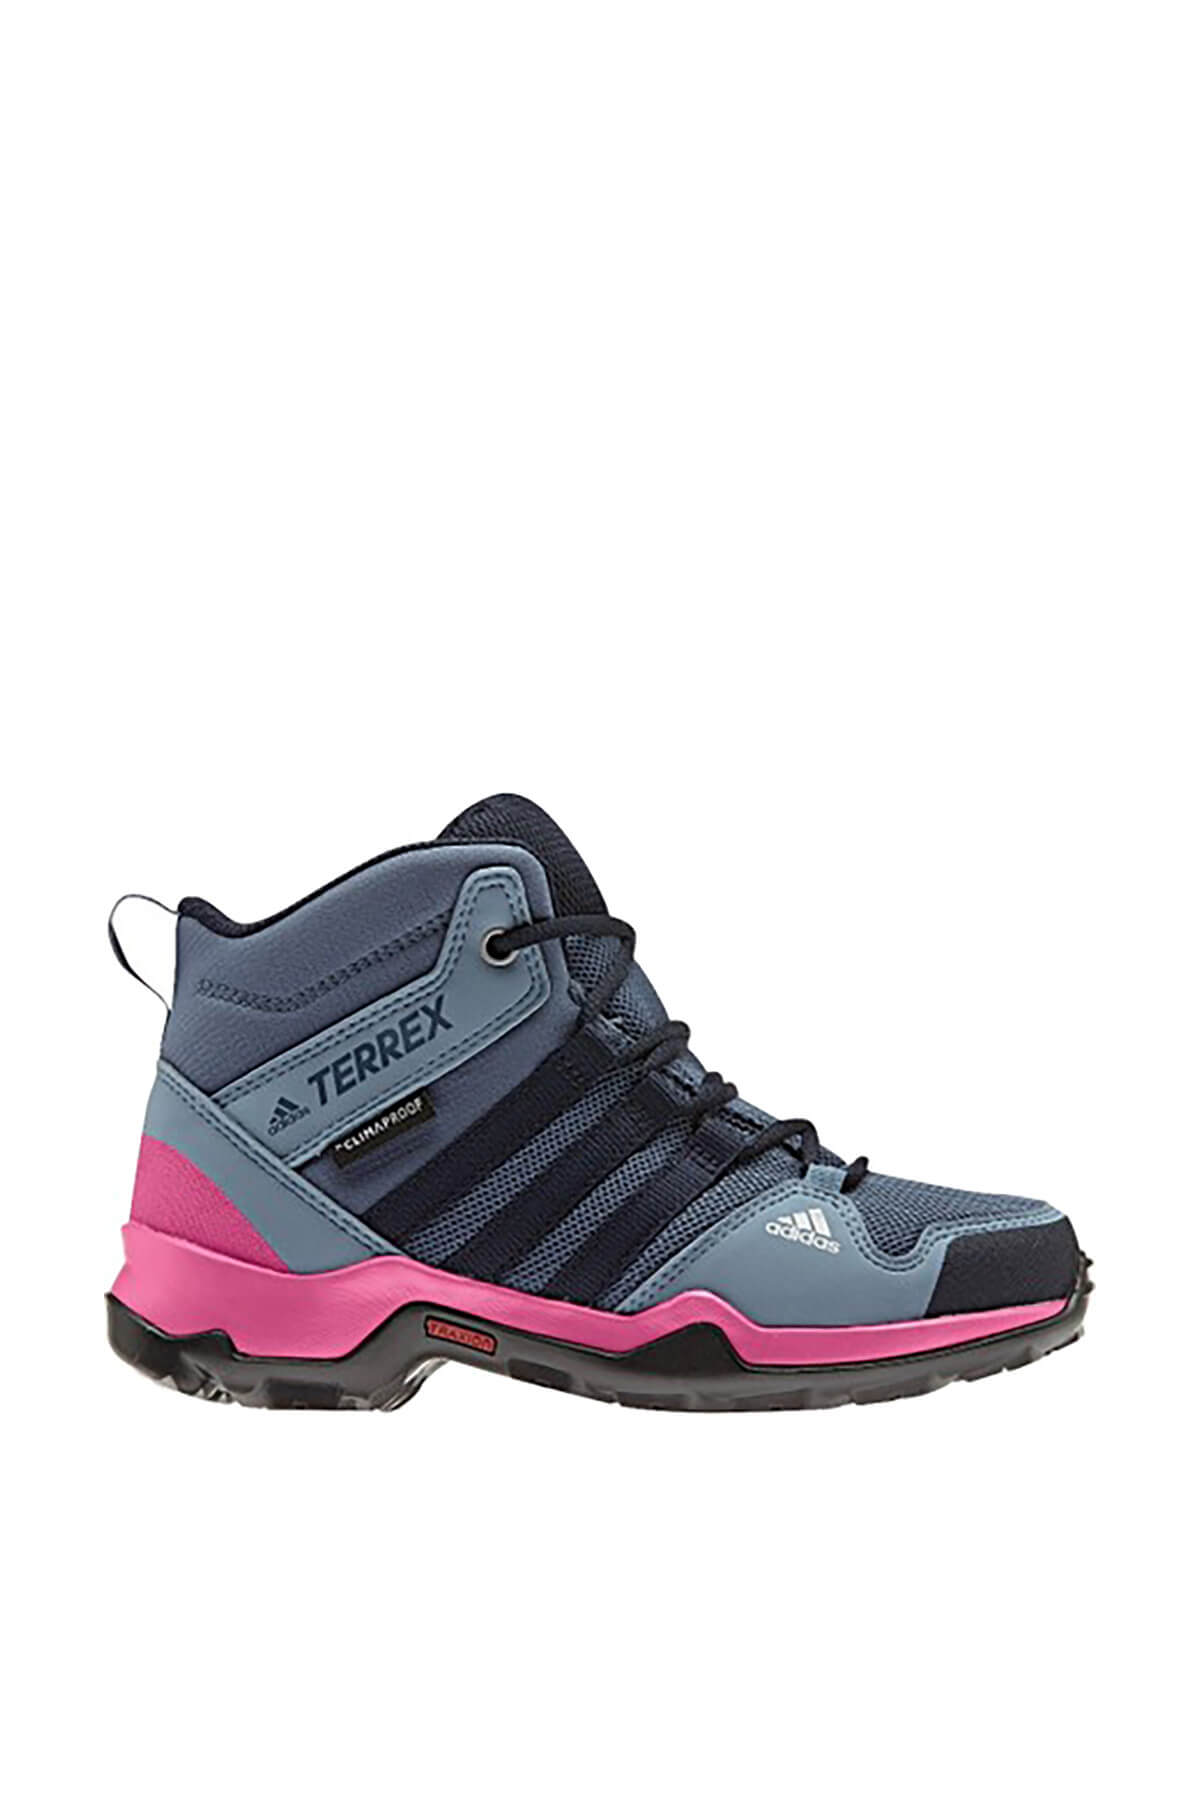 adidas TERREX AX2R MID CP İndigo Unisex Çocuk Fitness Ayakkabısı 100449111 2